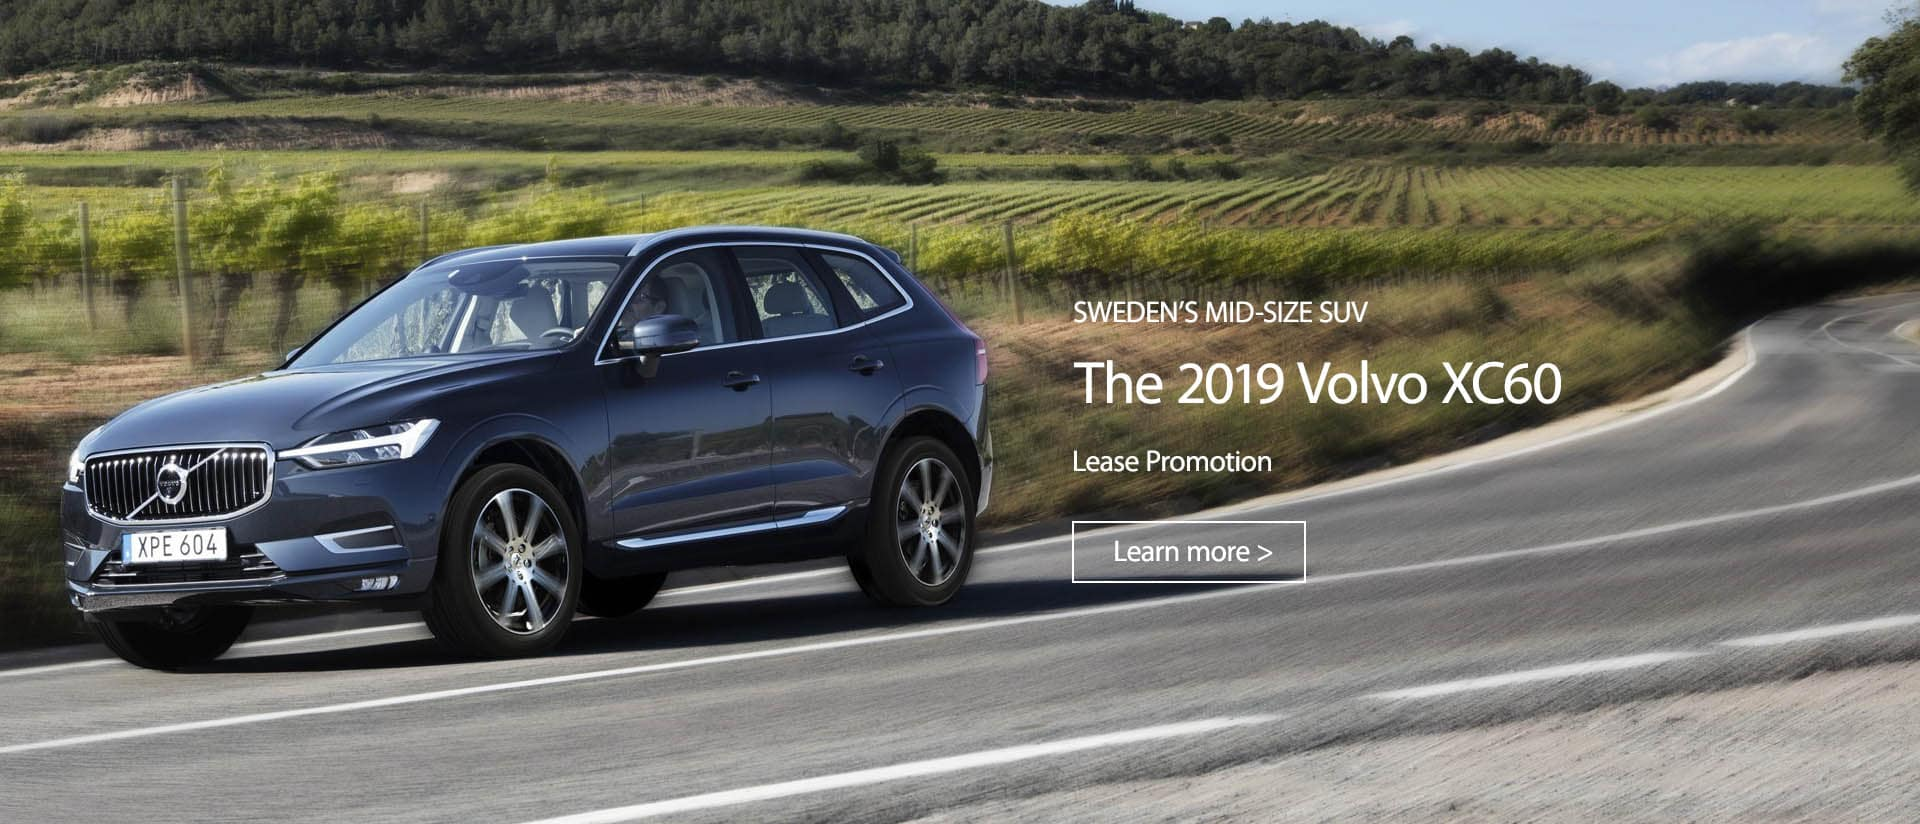 XC60 Lease Promotion